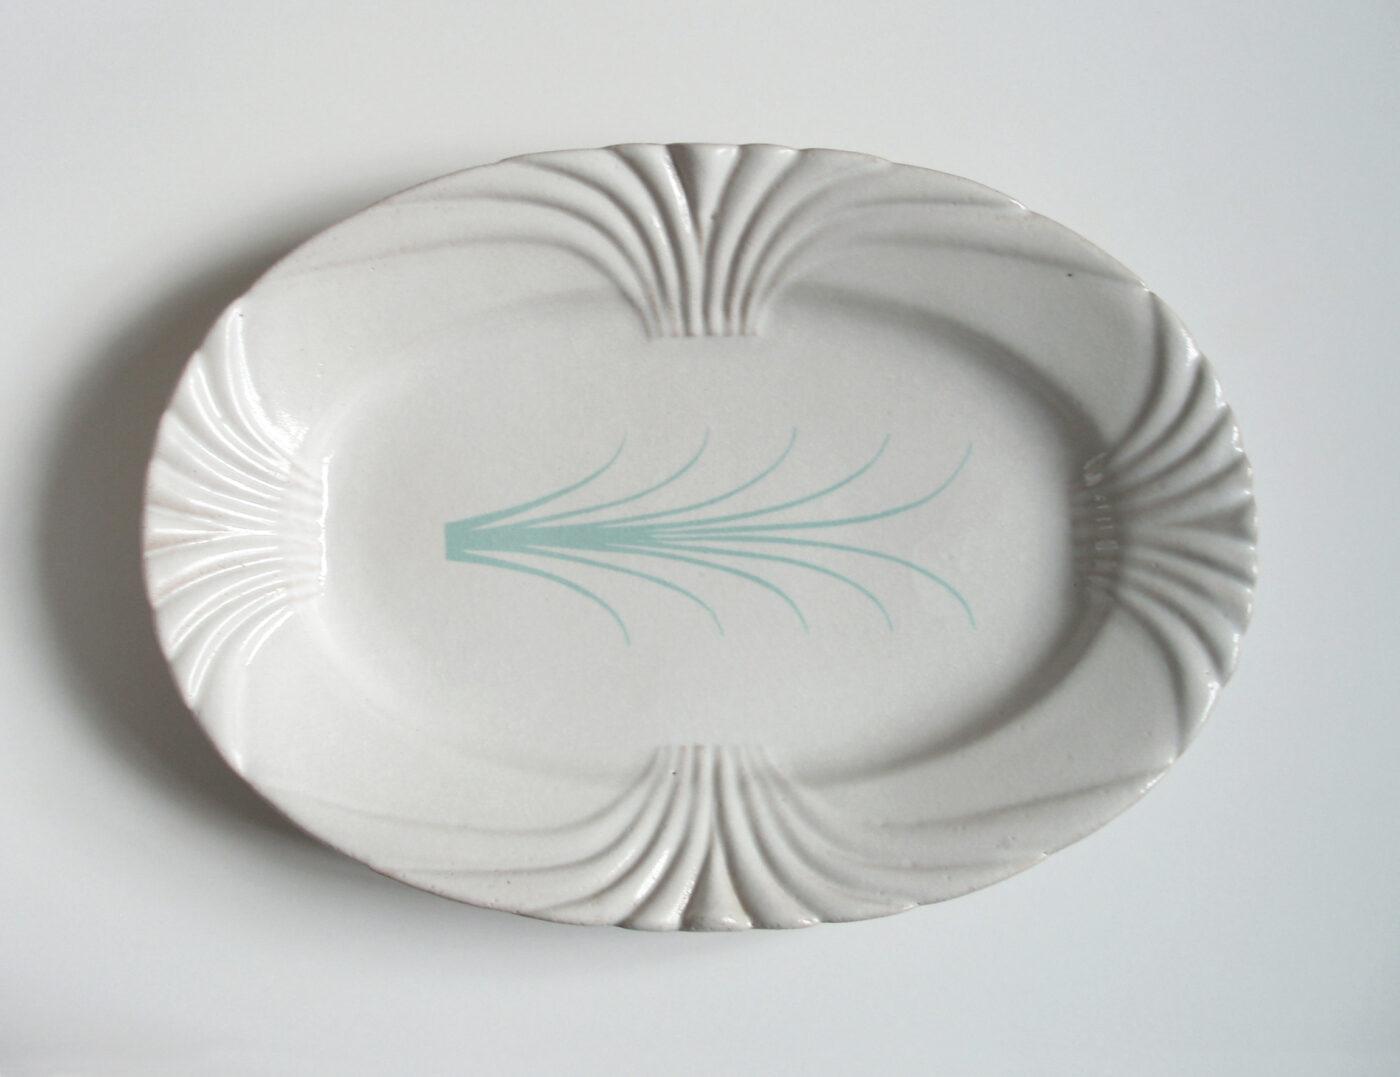 Keramiker Marianne Nielsen - Damaskusfade, Turkis, 2006